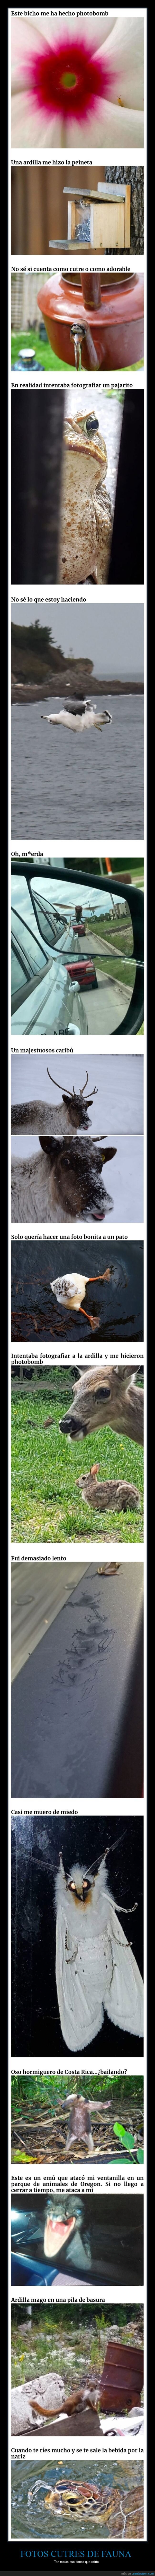 animales,cutres,fauna,fotos